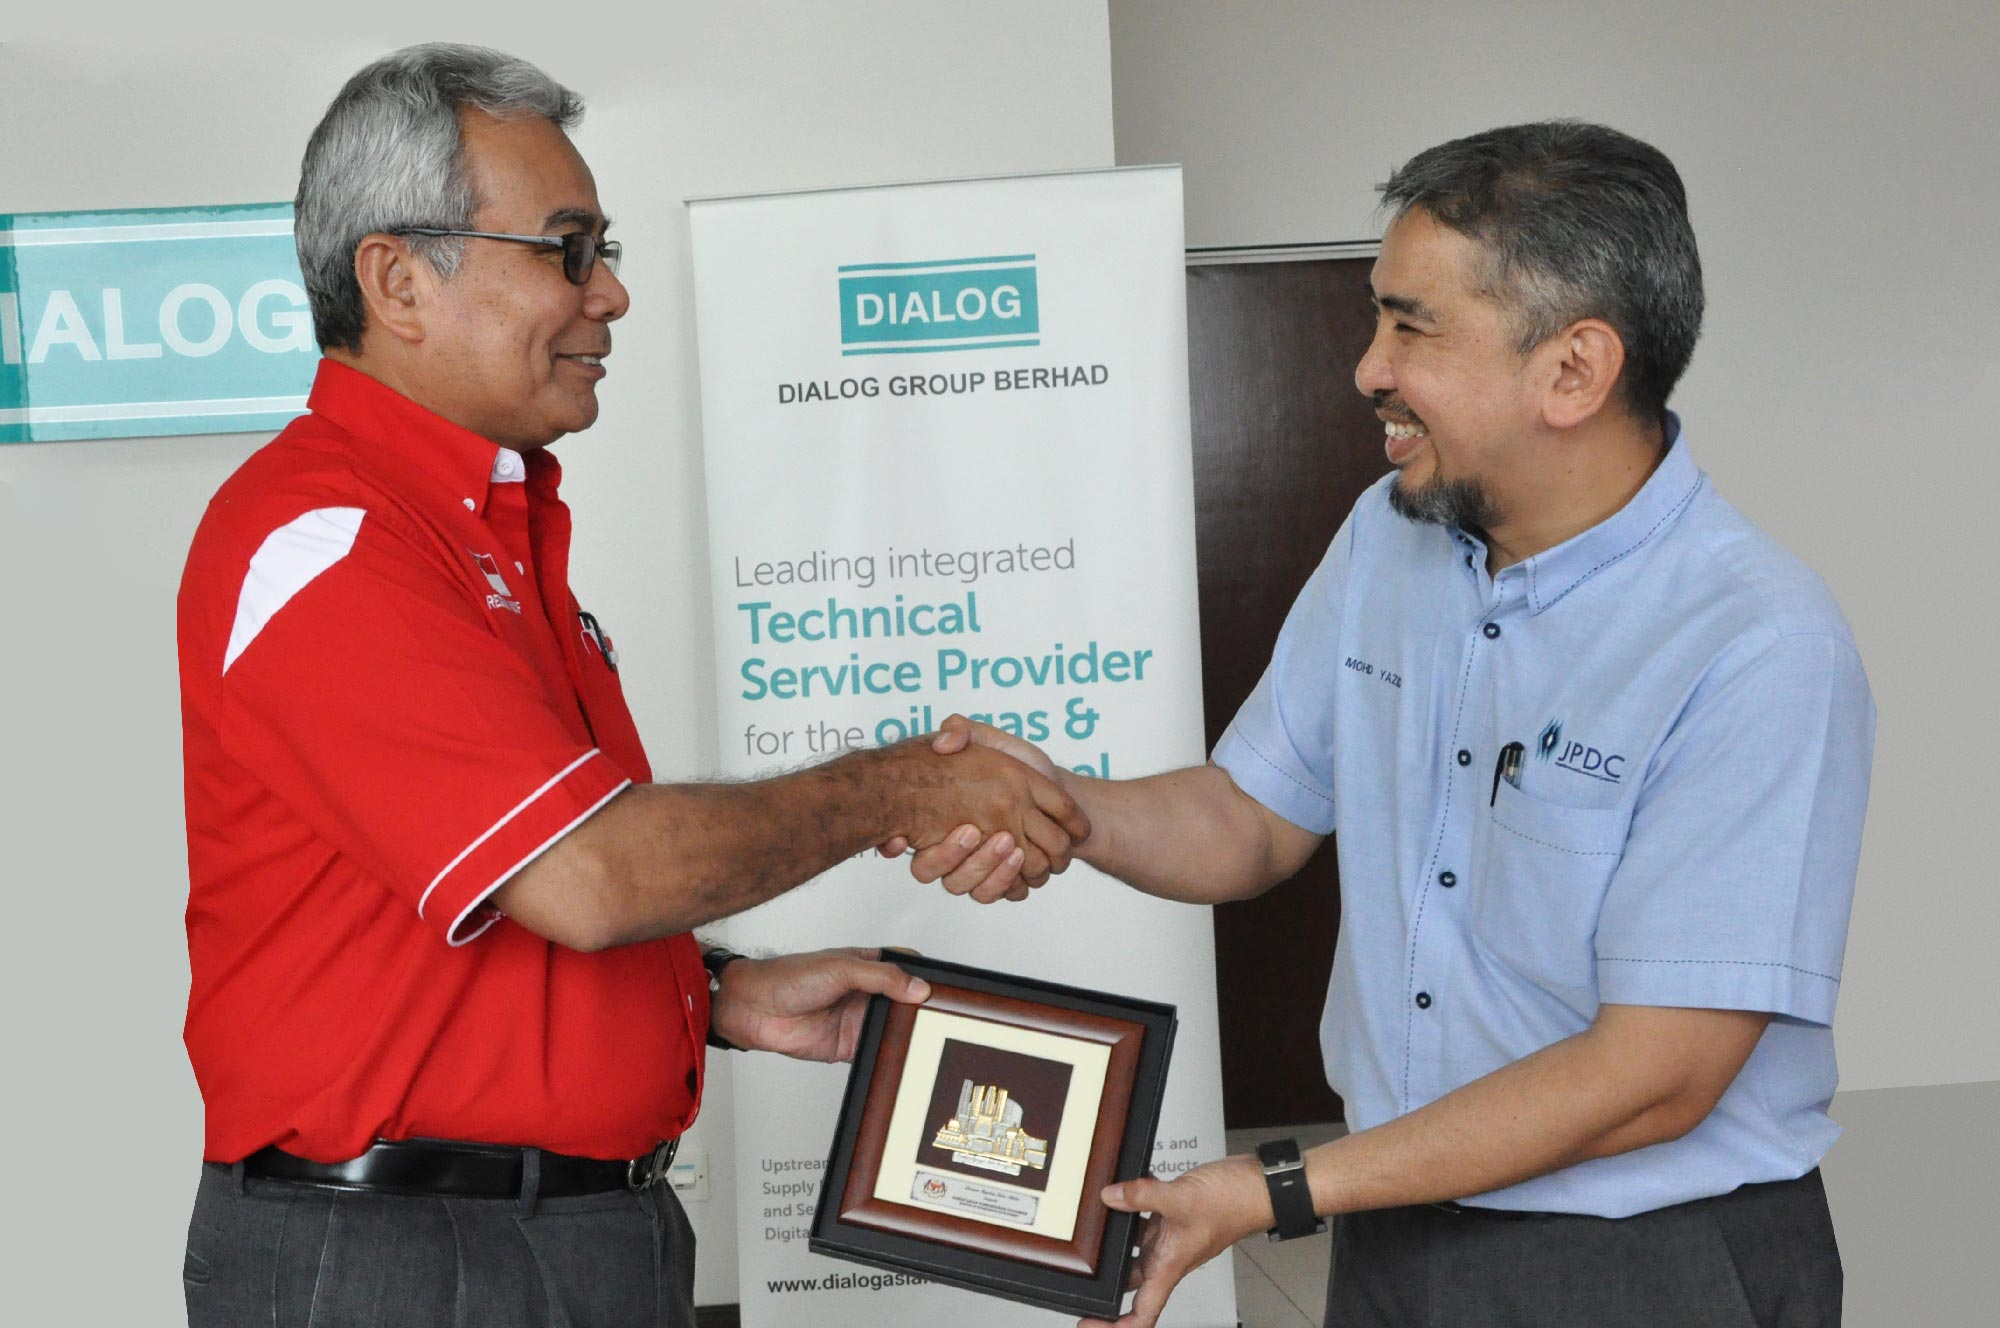 Official visit by YB Datuk Seri Mohd. Redzuan Yusof, Minister of Entrepreneur Development